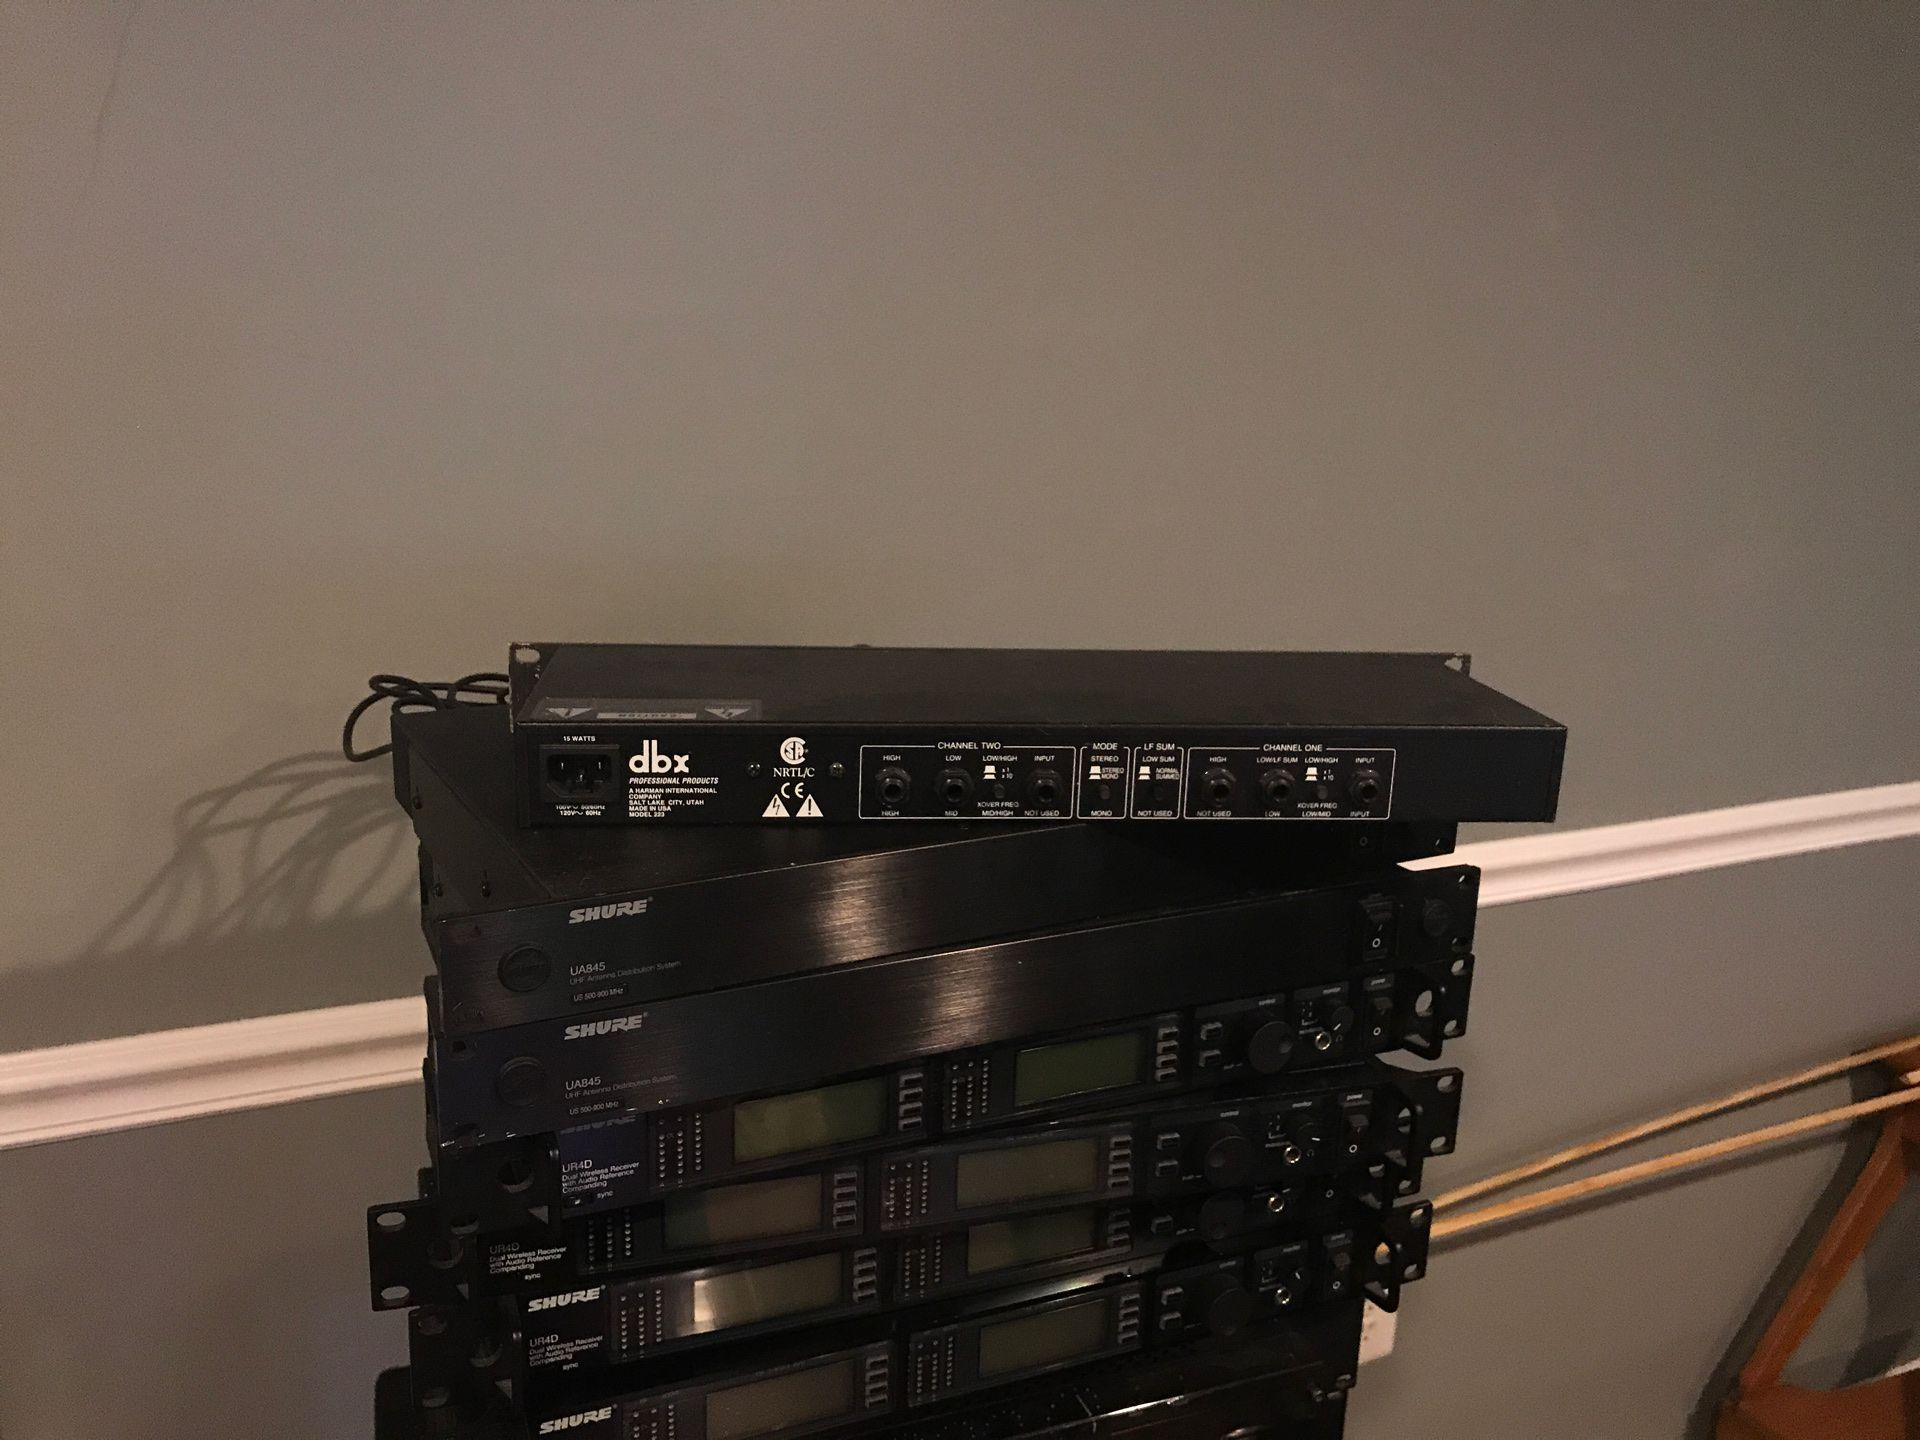 DBX 223 stereo crossover